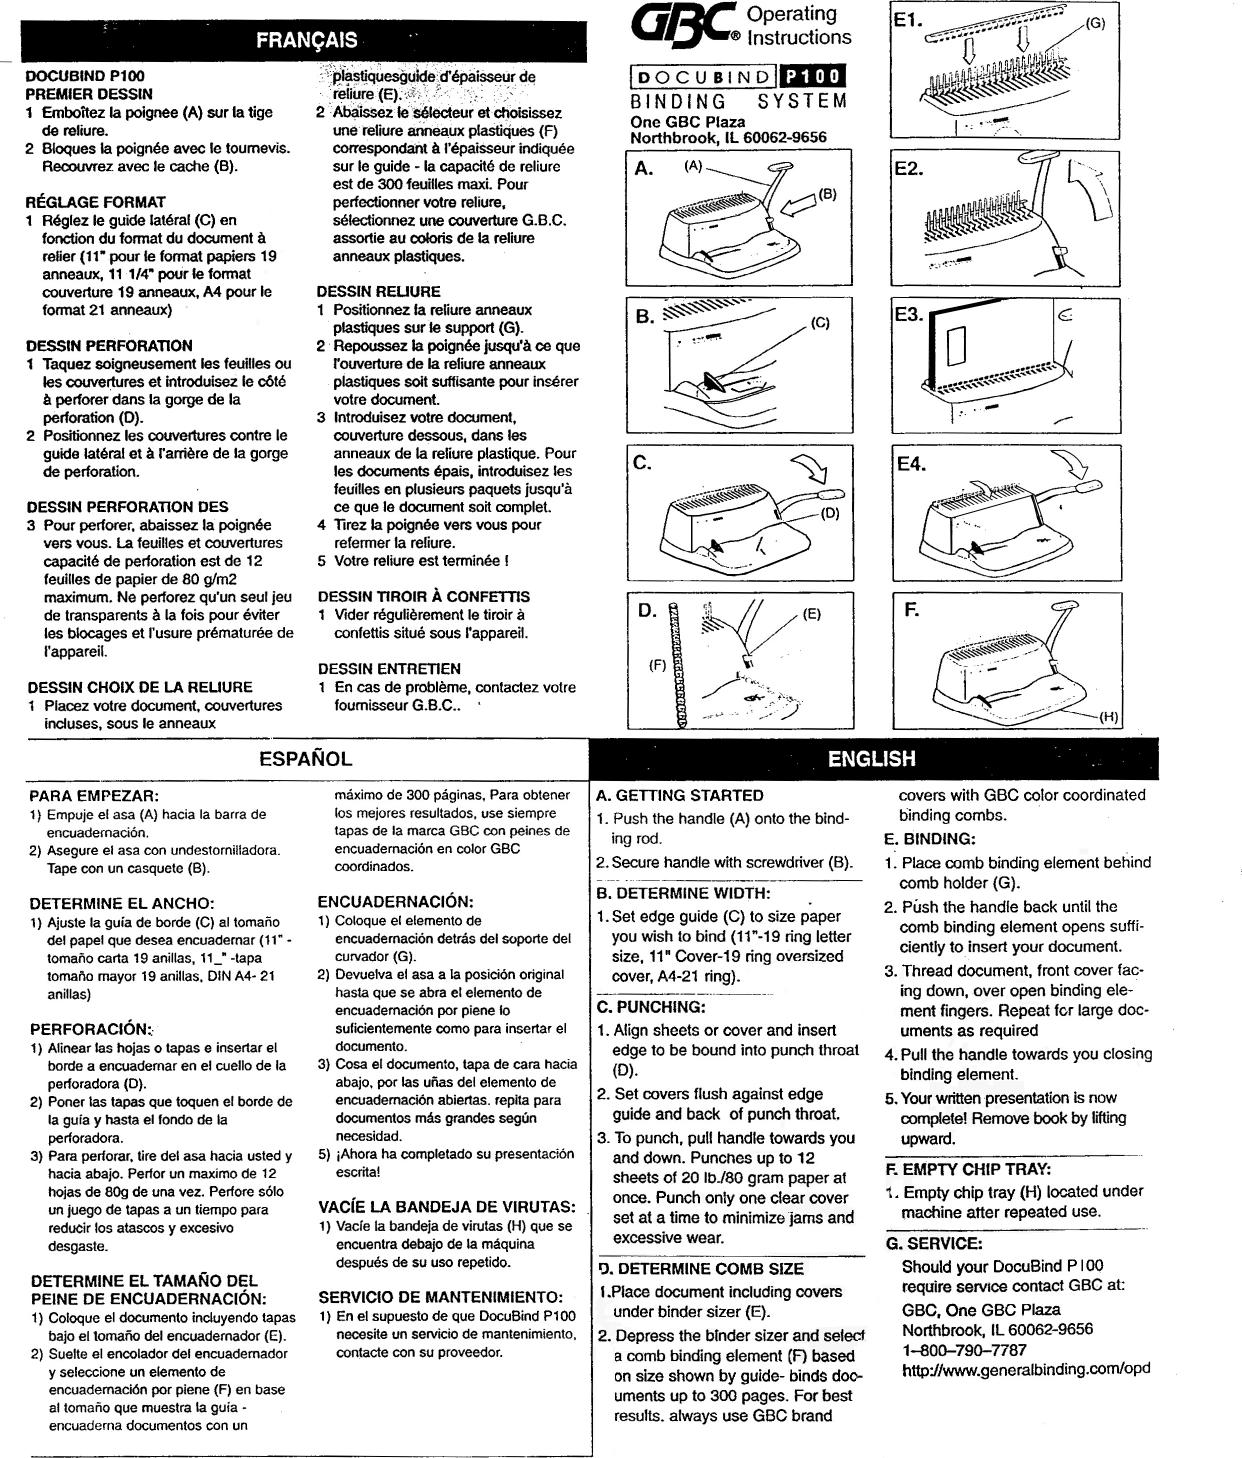 gbc docubind p200 instruction manual